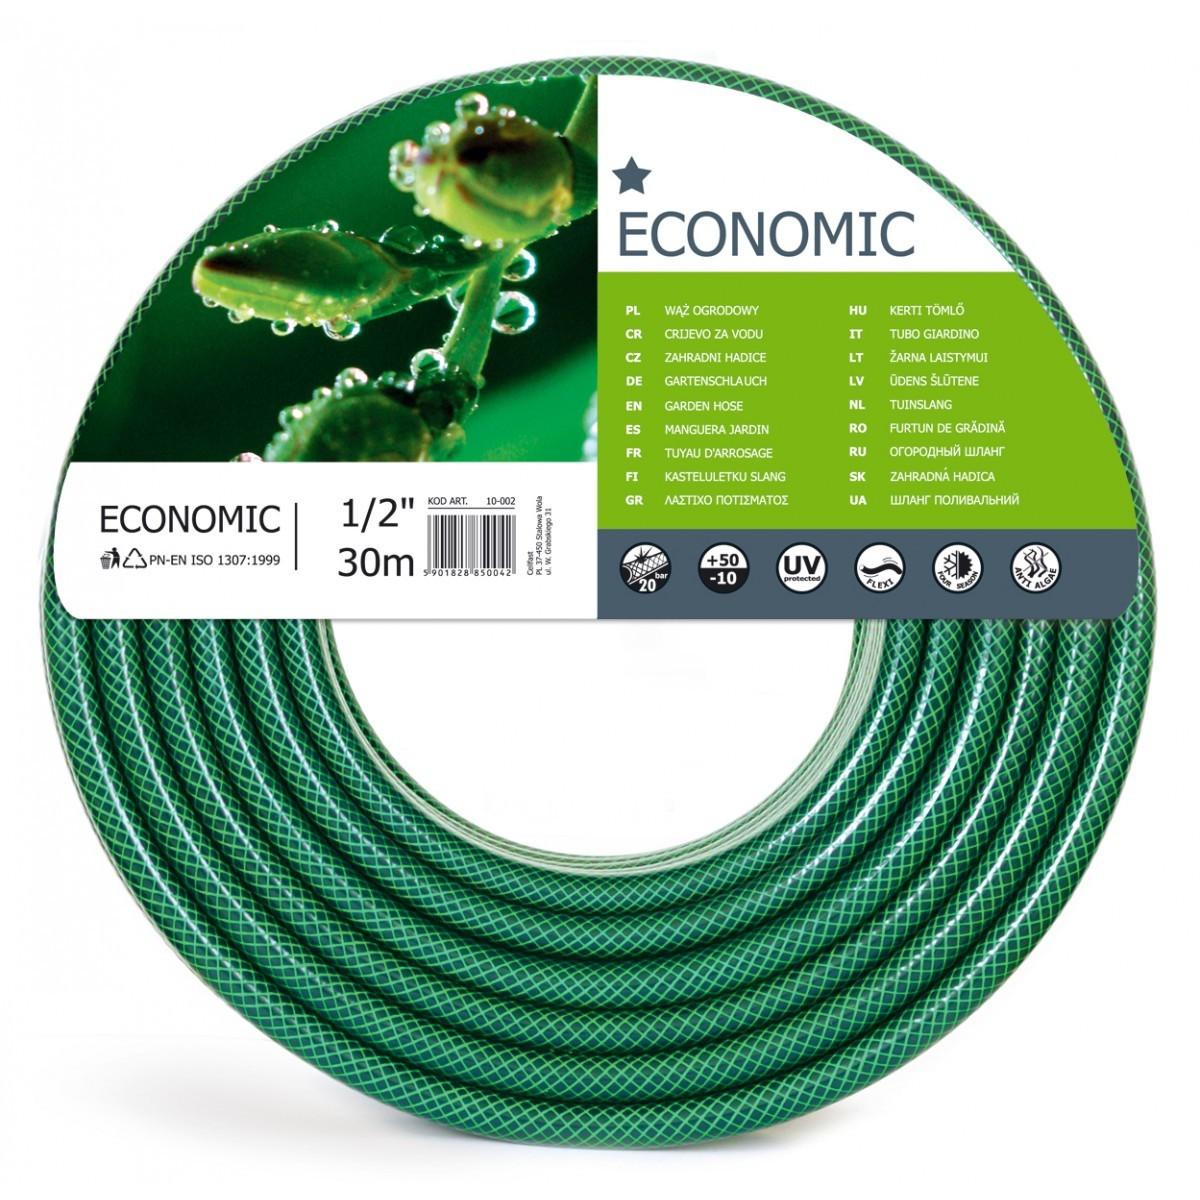 Садовый шланг Cellfast ECONOMIC 30 м 1/2 (10-002)